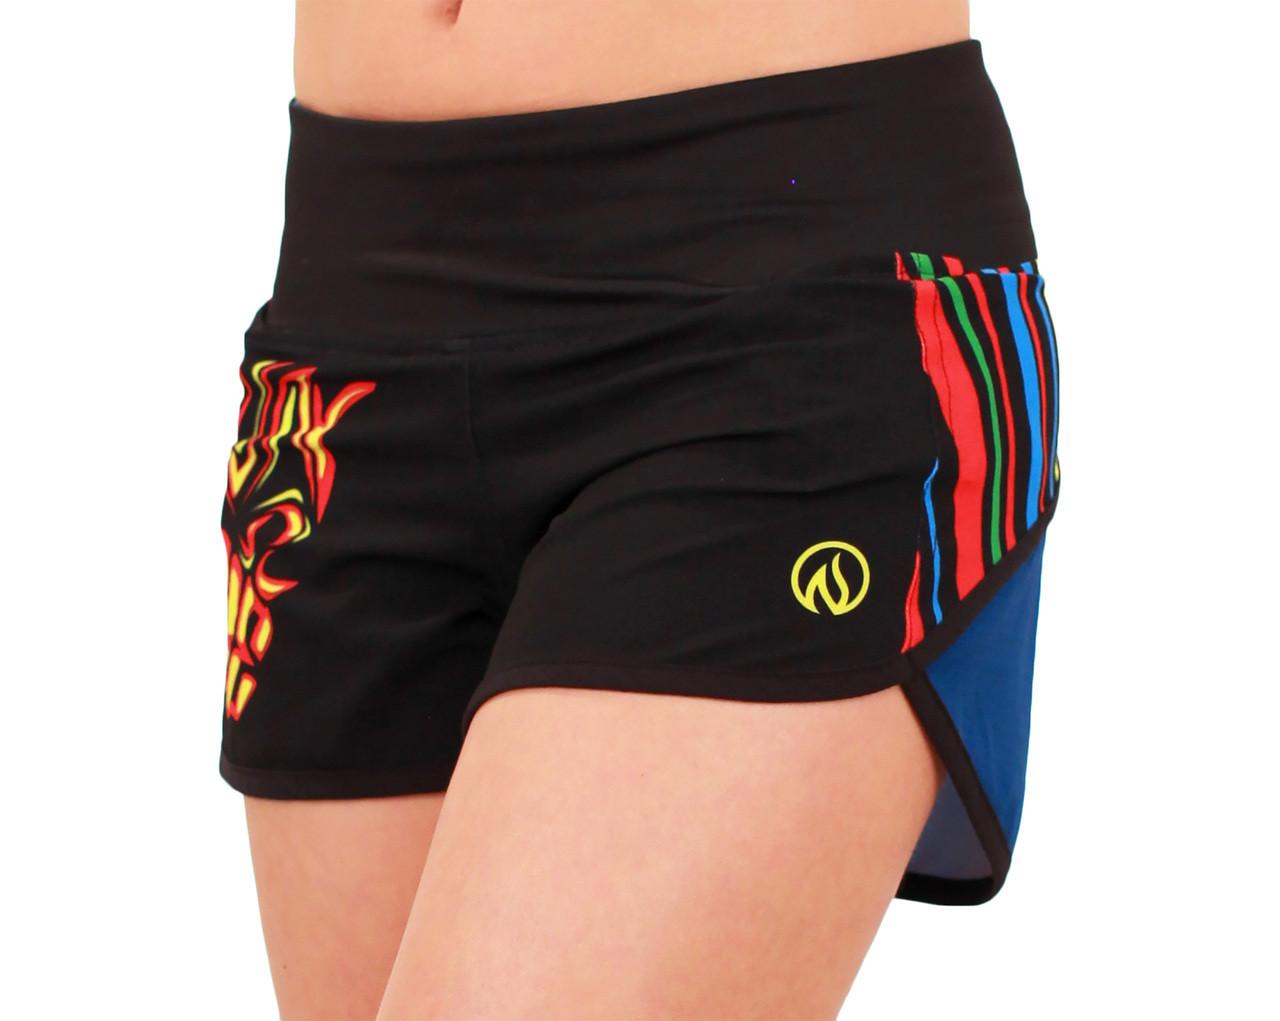 INKnBURN Women's Run or Die Shorts Waistband Up